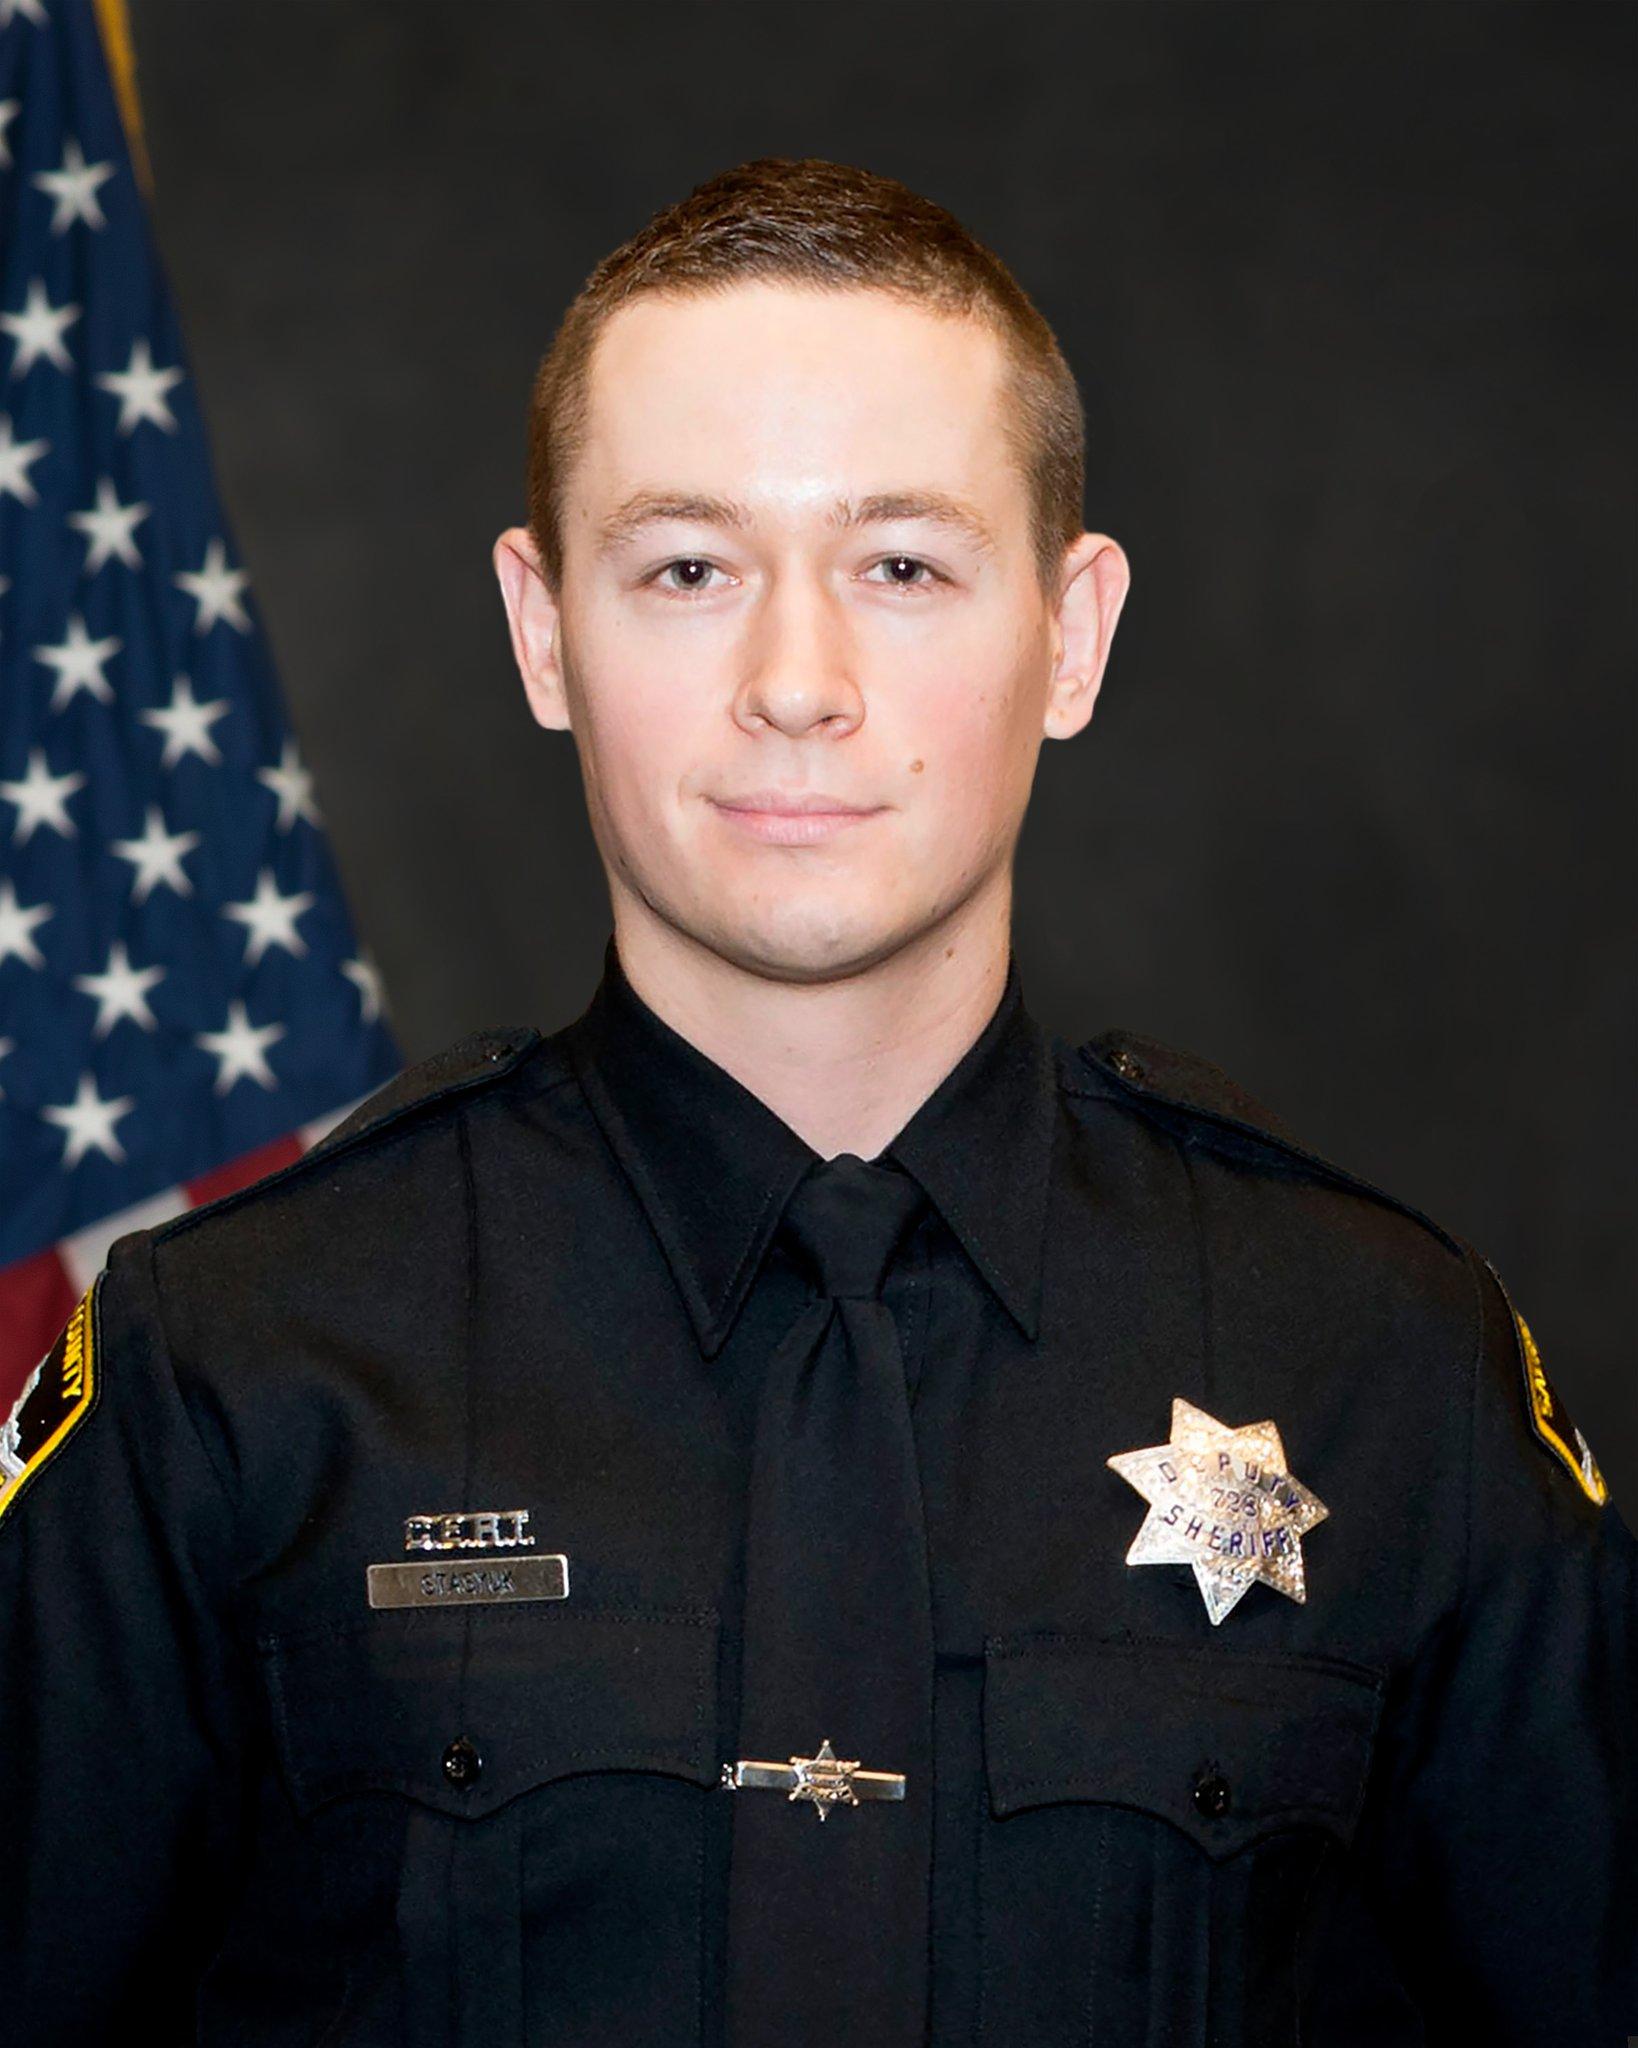 Deputy Sheriff Mark V. Stasyuk | Sacramento County Sheriff's Department, California